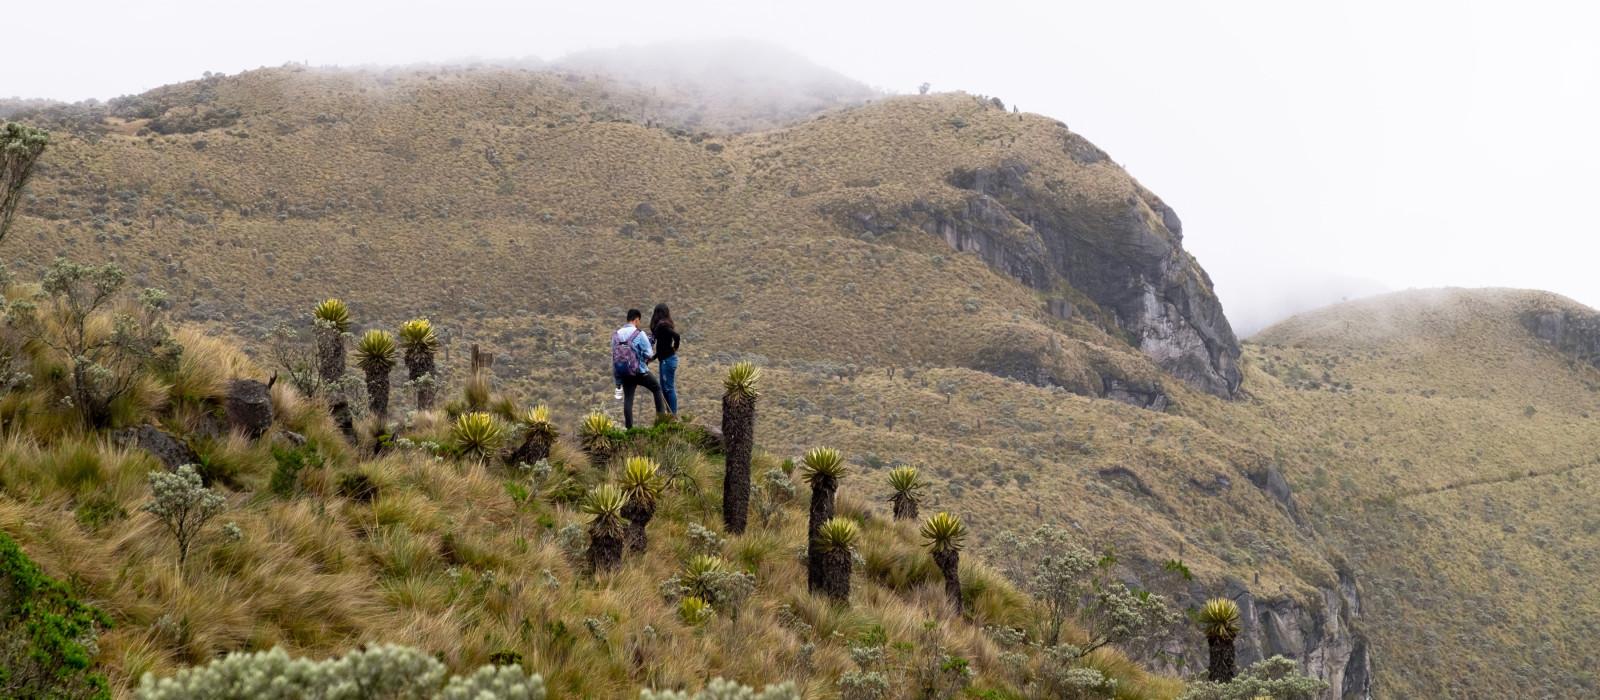 Menschen beim Wandern im Los Nevados National Natural Park, Kolumbien, Südamerika